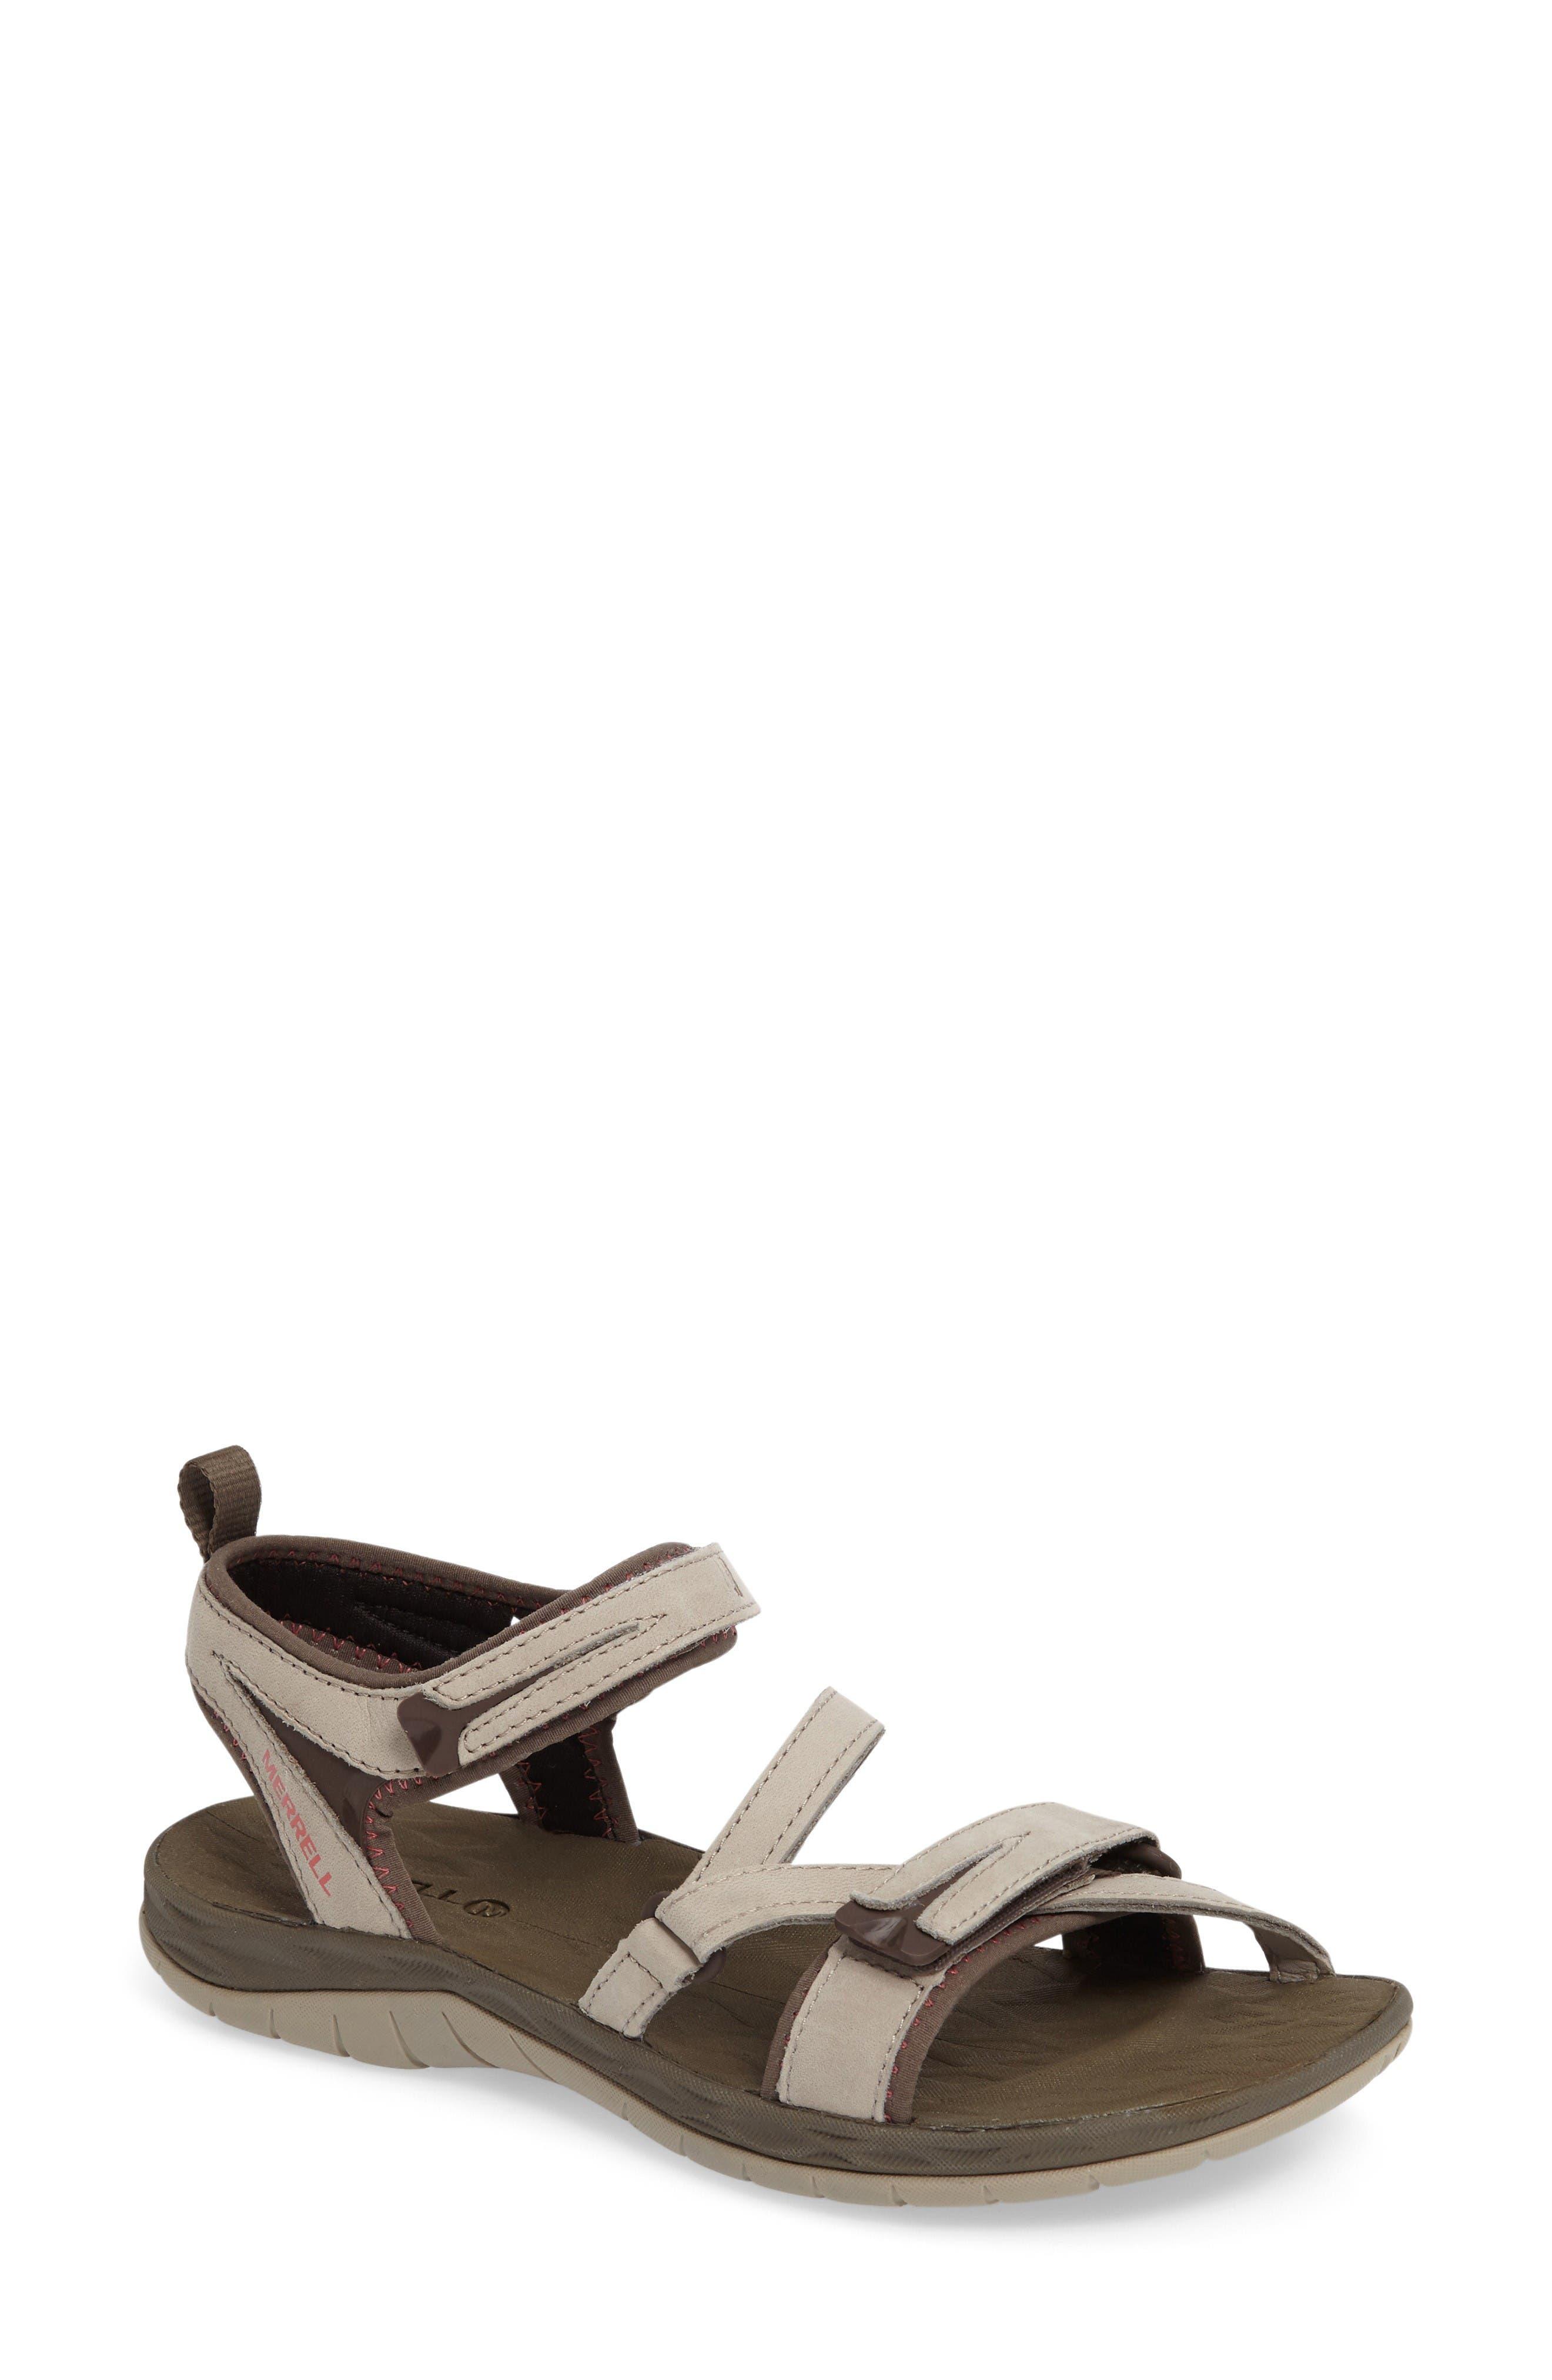 Main Image - Merrell Siren Water Friendly Sport Sandal (Women)